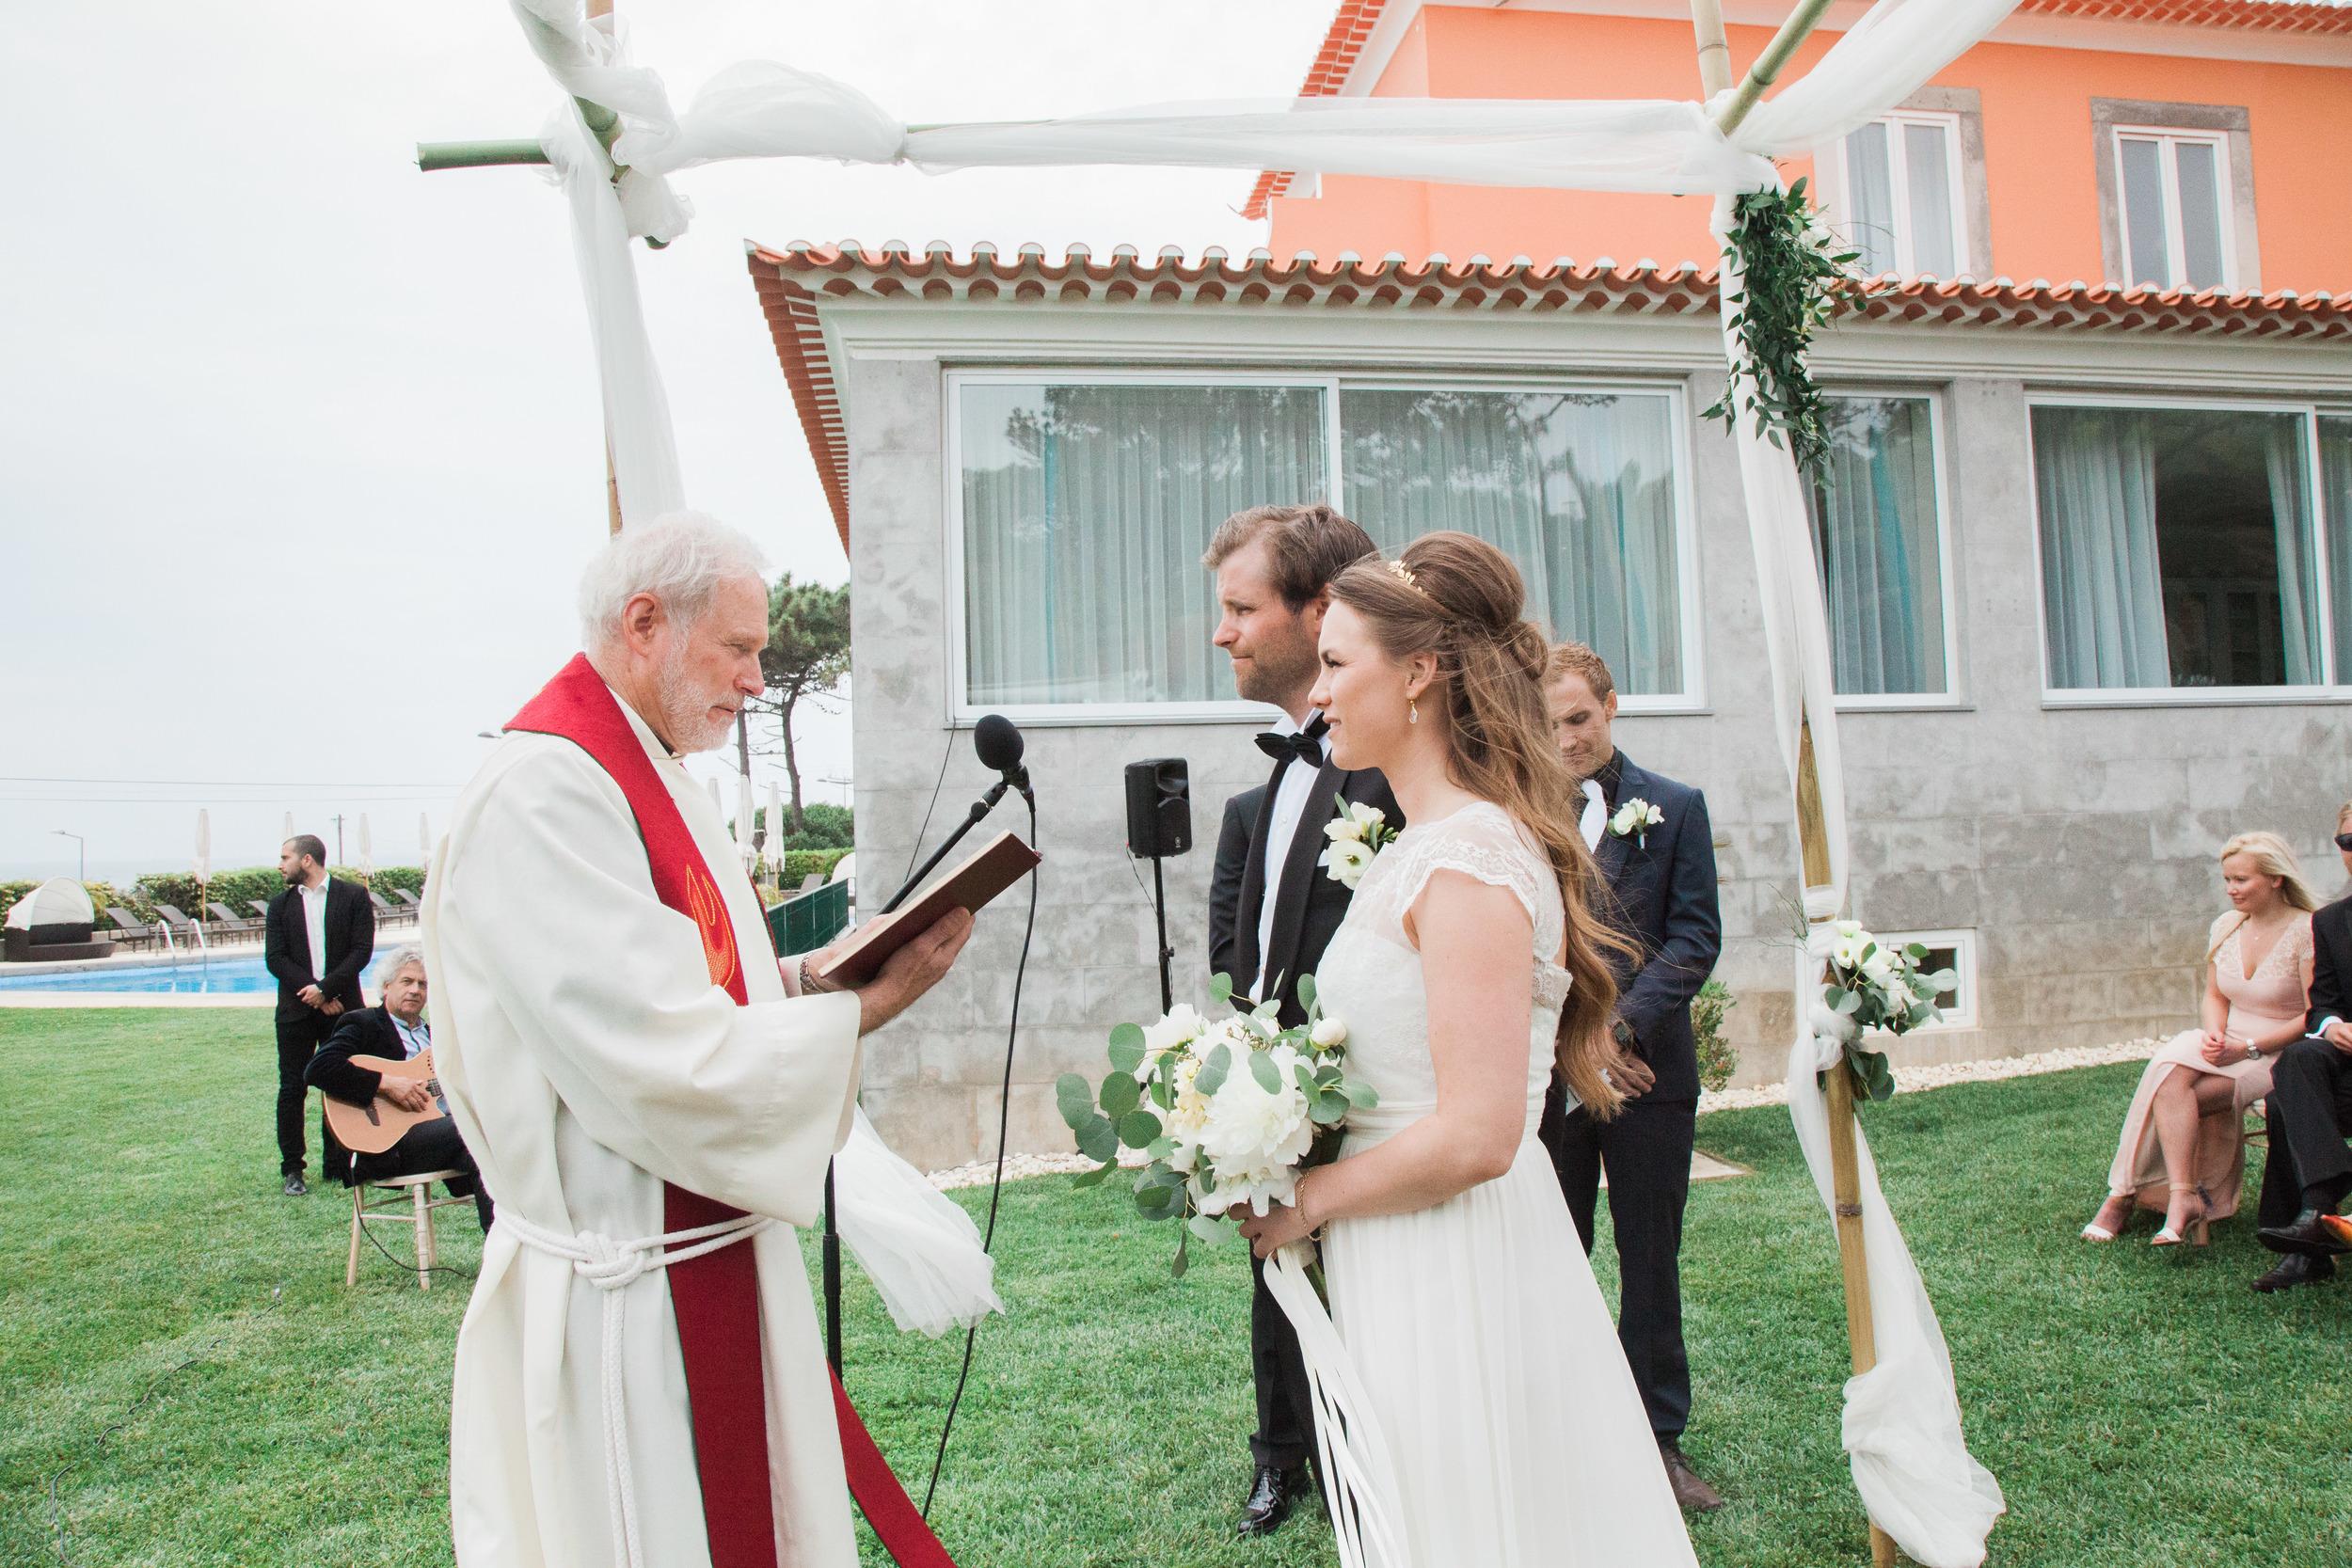 mariarao+wedding+portugal+cascais-222.jpg